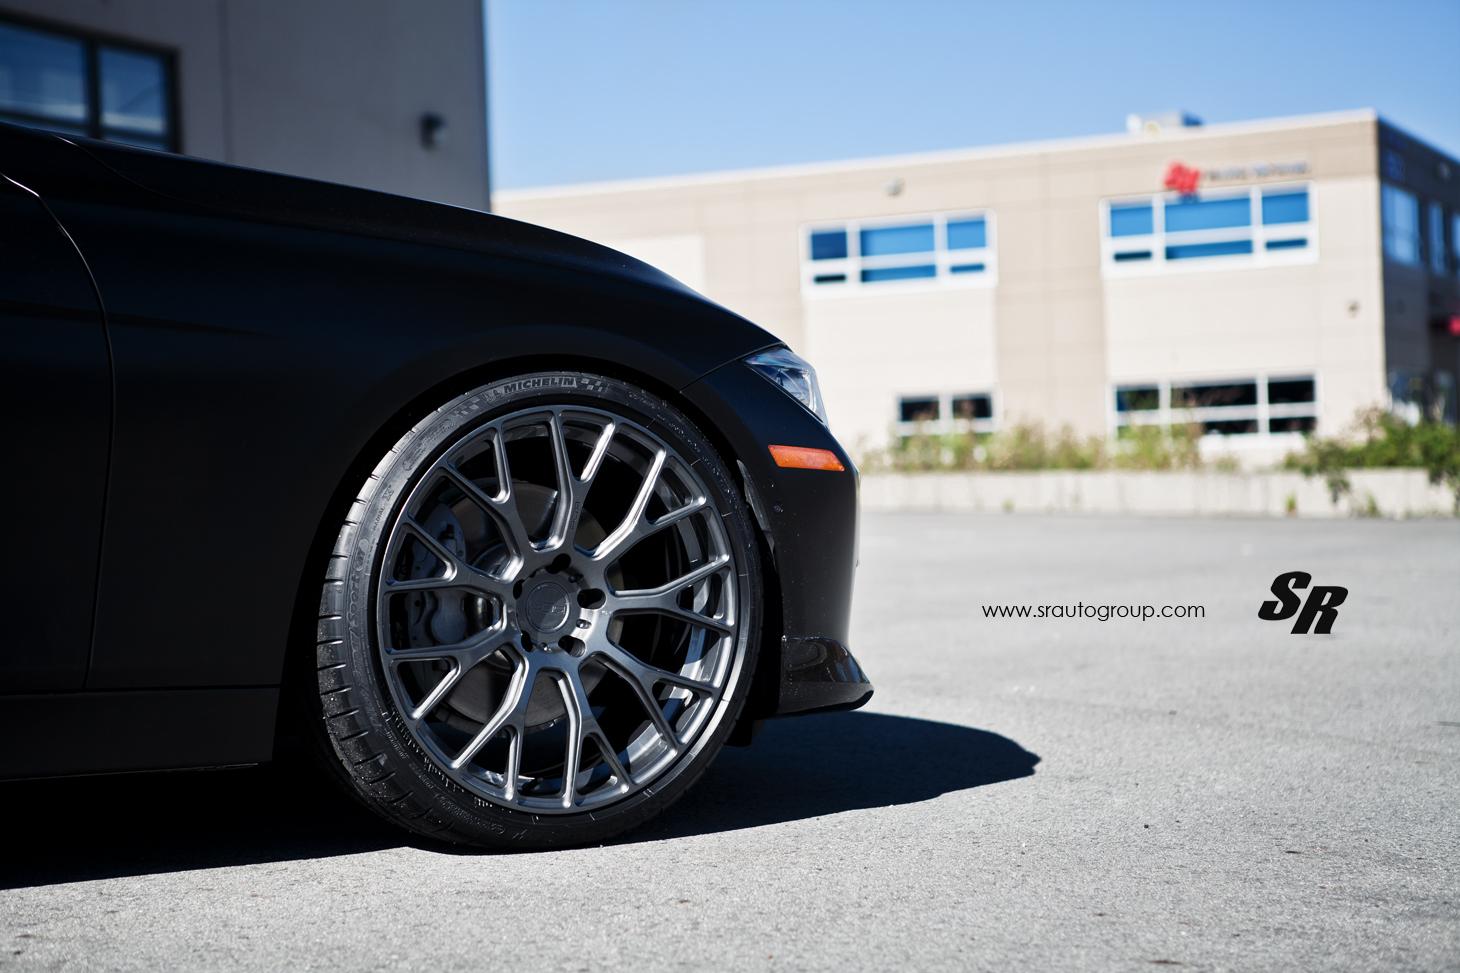 Satin Black Bmw F30 3 Series Rides On Pur Wheels Autoevolution